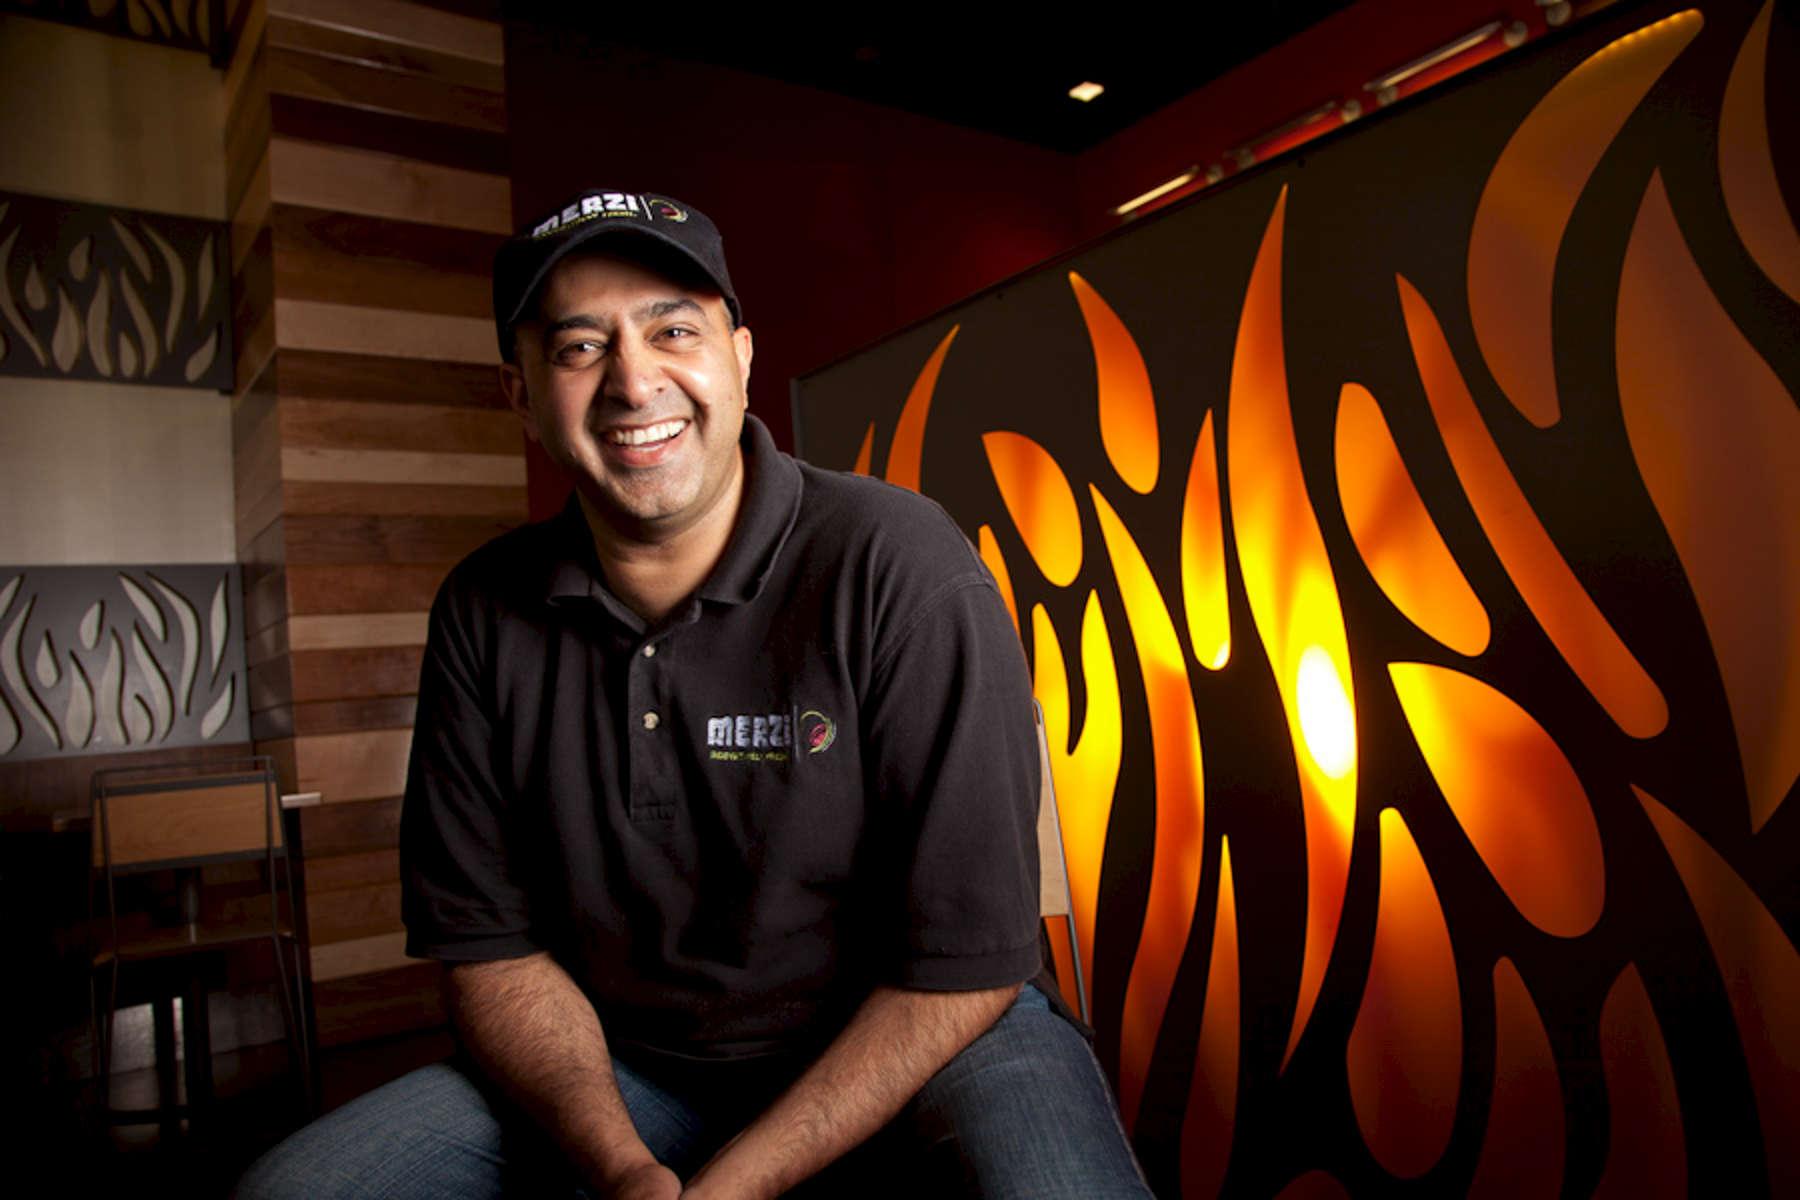 Qaiser Kazmi at his Indian restaurant Merzi in Washington DC on June 6, 2011. Photos by Paul Morse